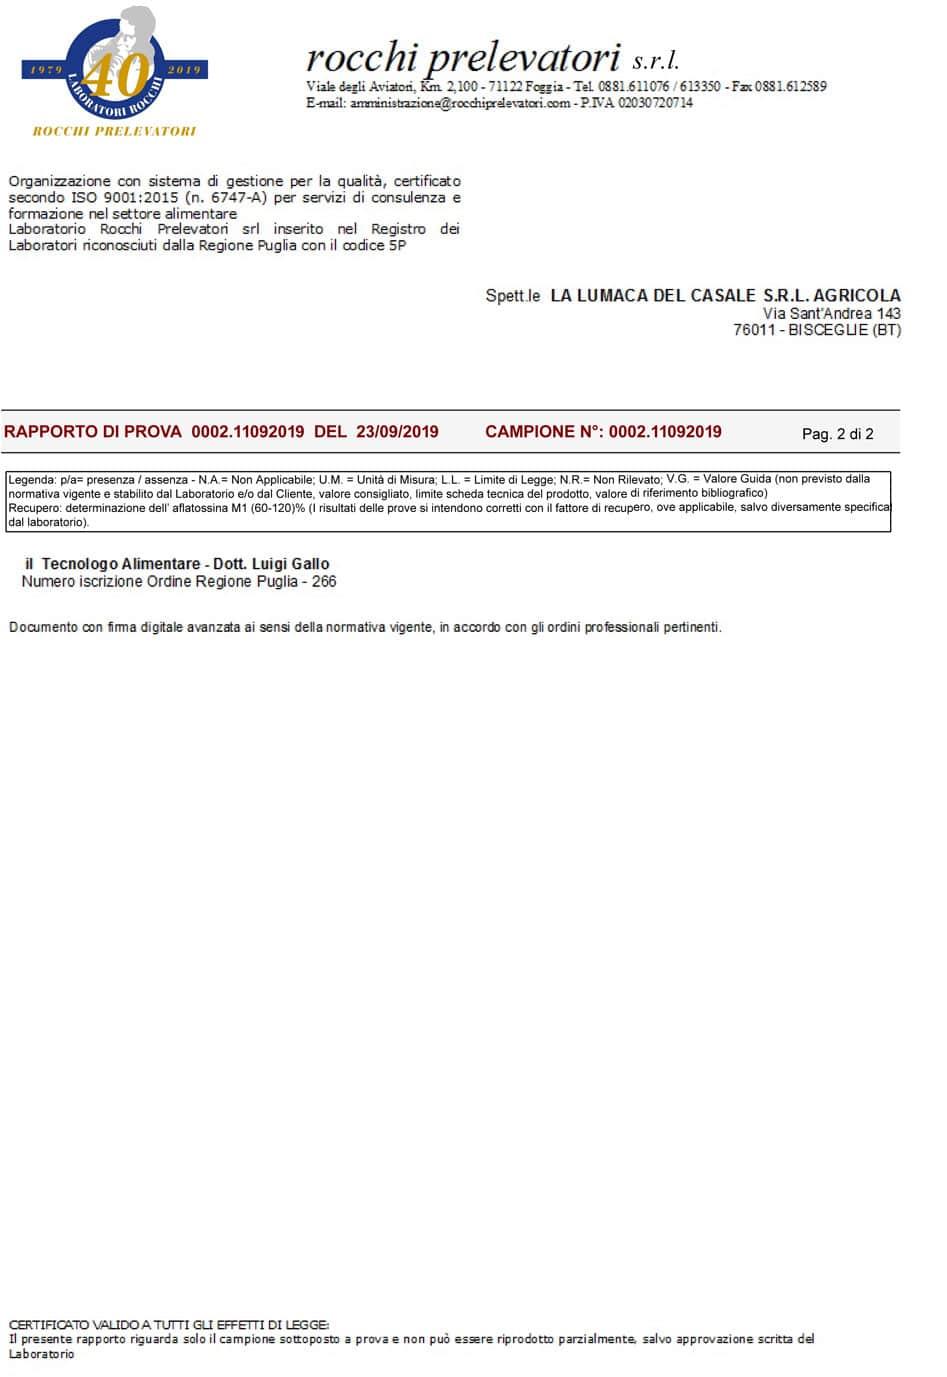 Analisi Batteriologica Bava Pura LoveHelix Pagina 2